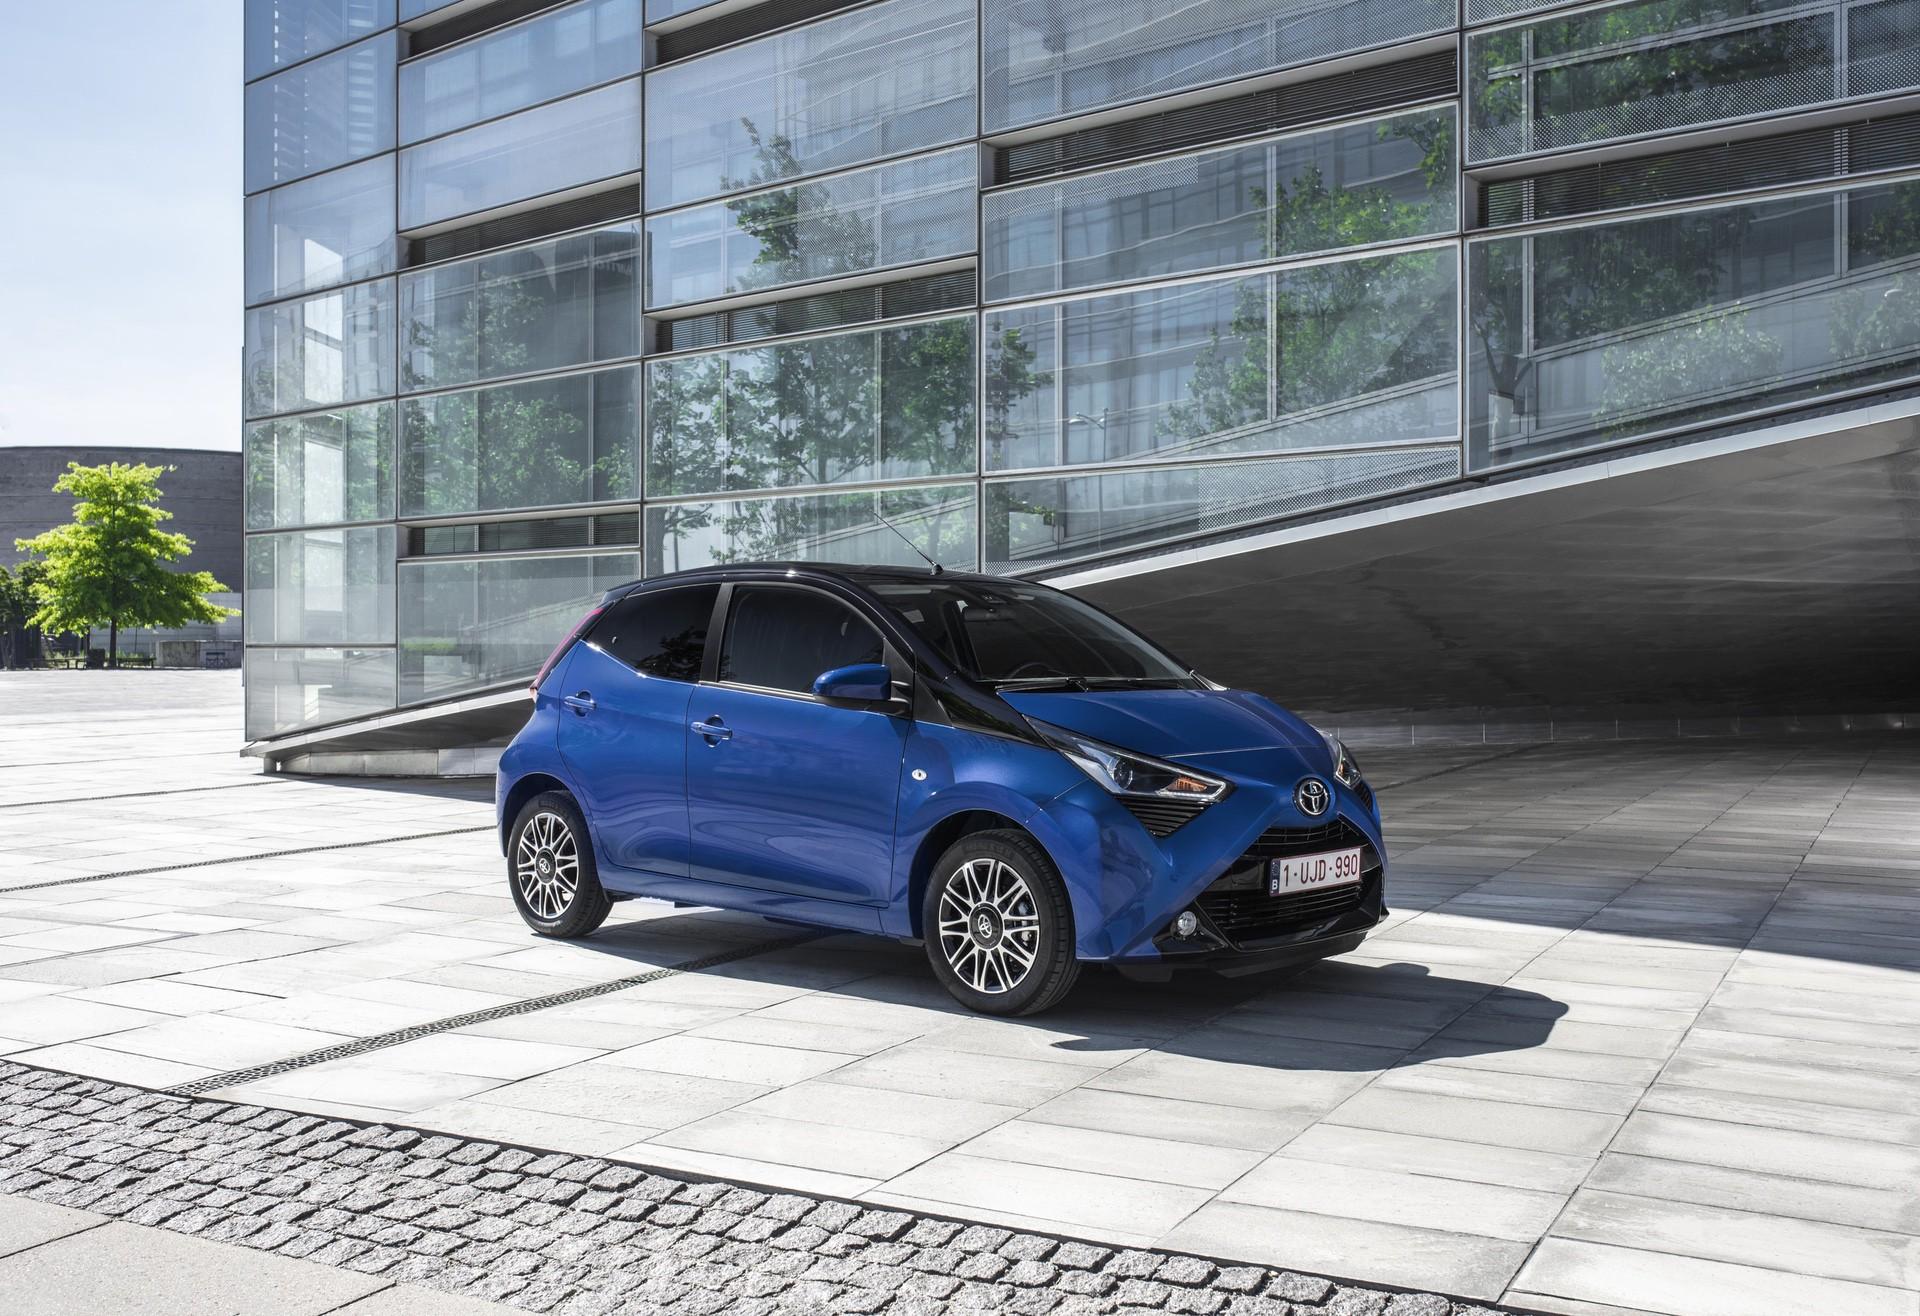 Toyota_Aygo_facelift_presskit_0030